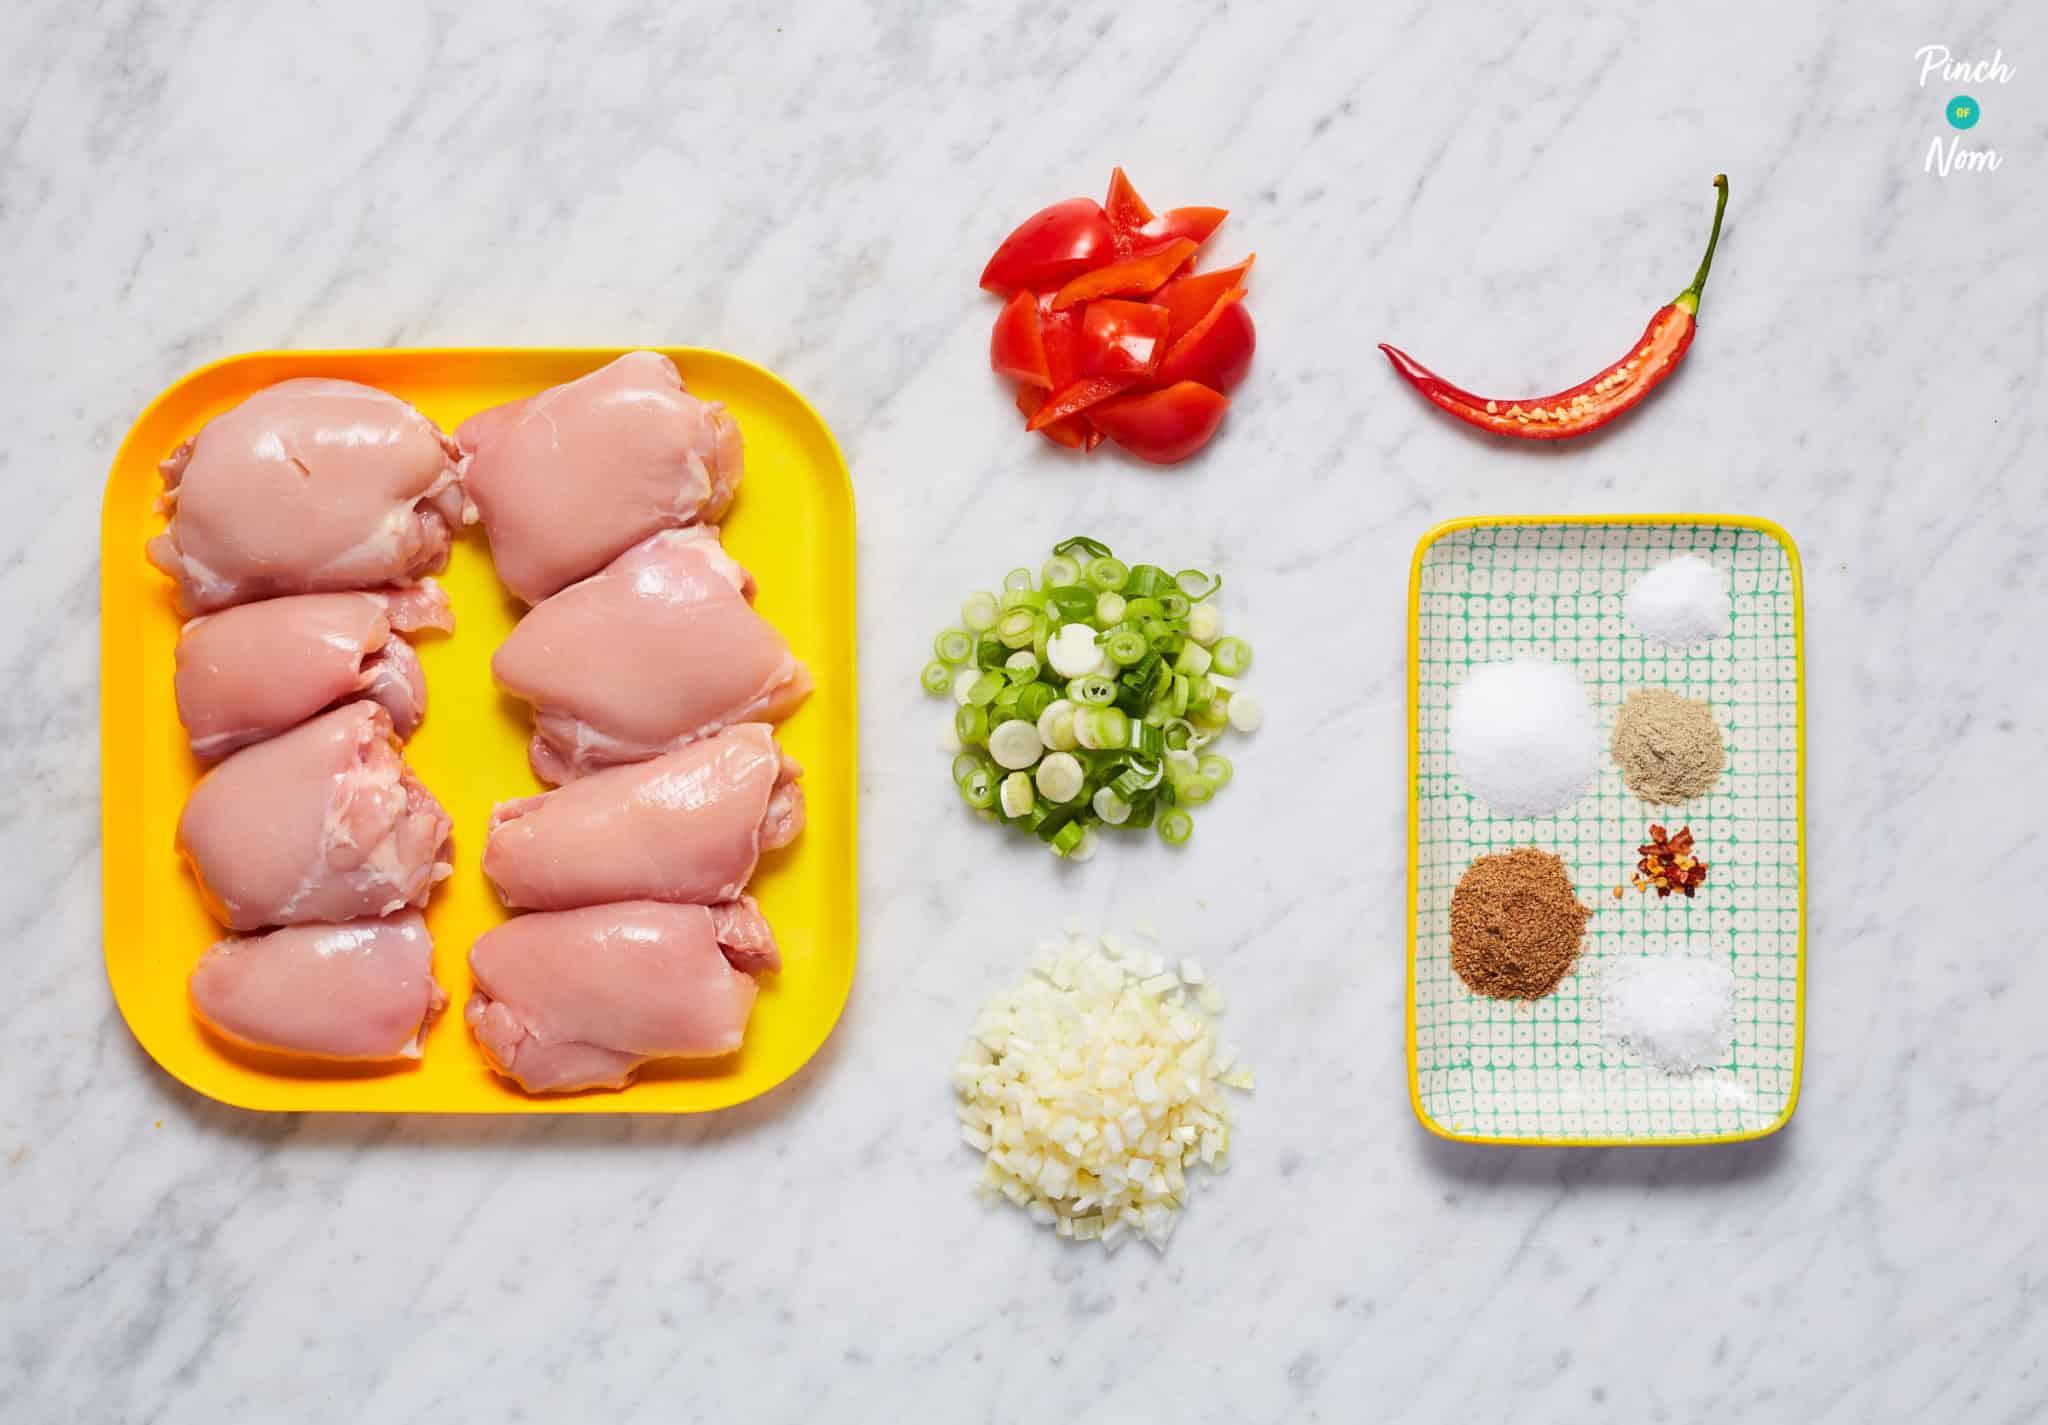 Salt and Pepper Chicken - Pinch of Nom Slimming Recipes